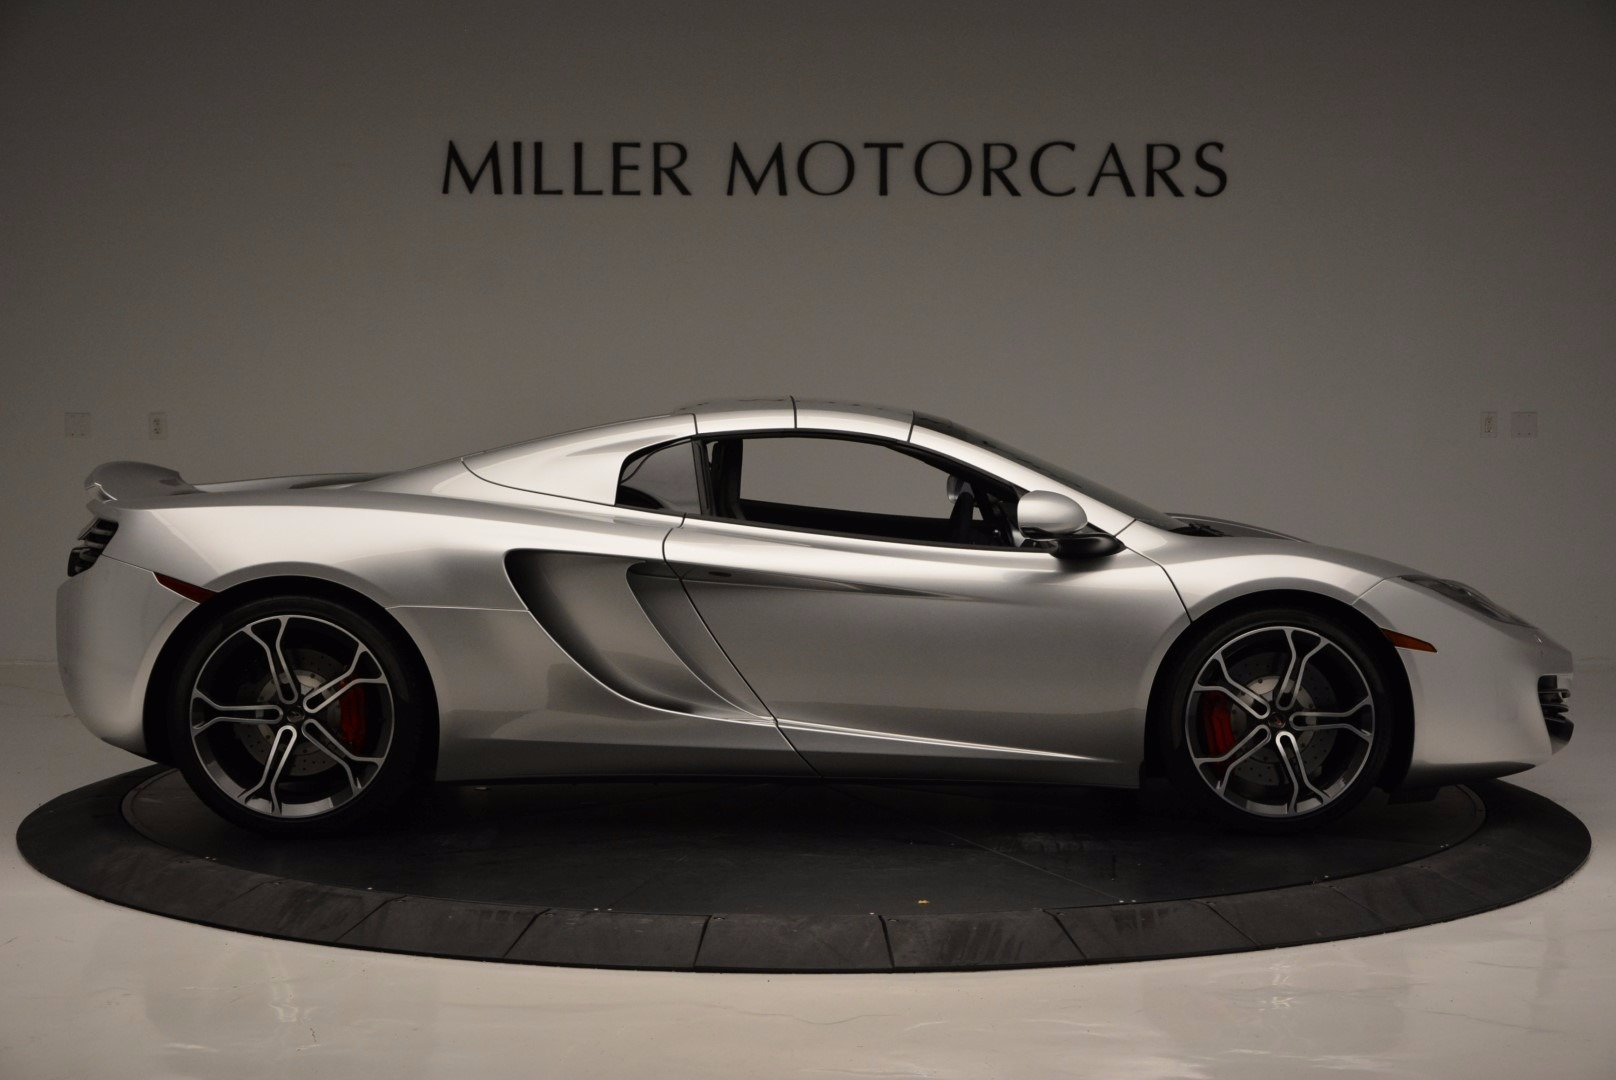 Used 2014 McLaren MP4-12C Spider  For Sale In Greenwich, CT. Alfa Romeo of Greenwich, 3089 627_p20